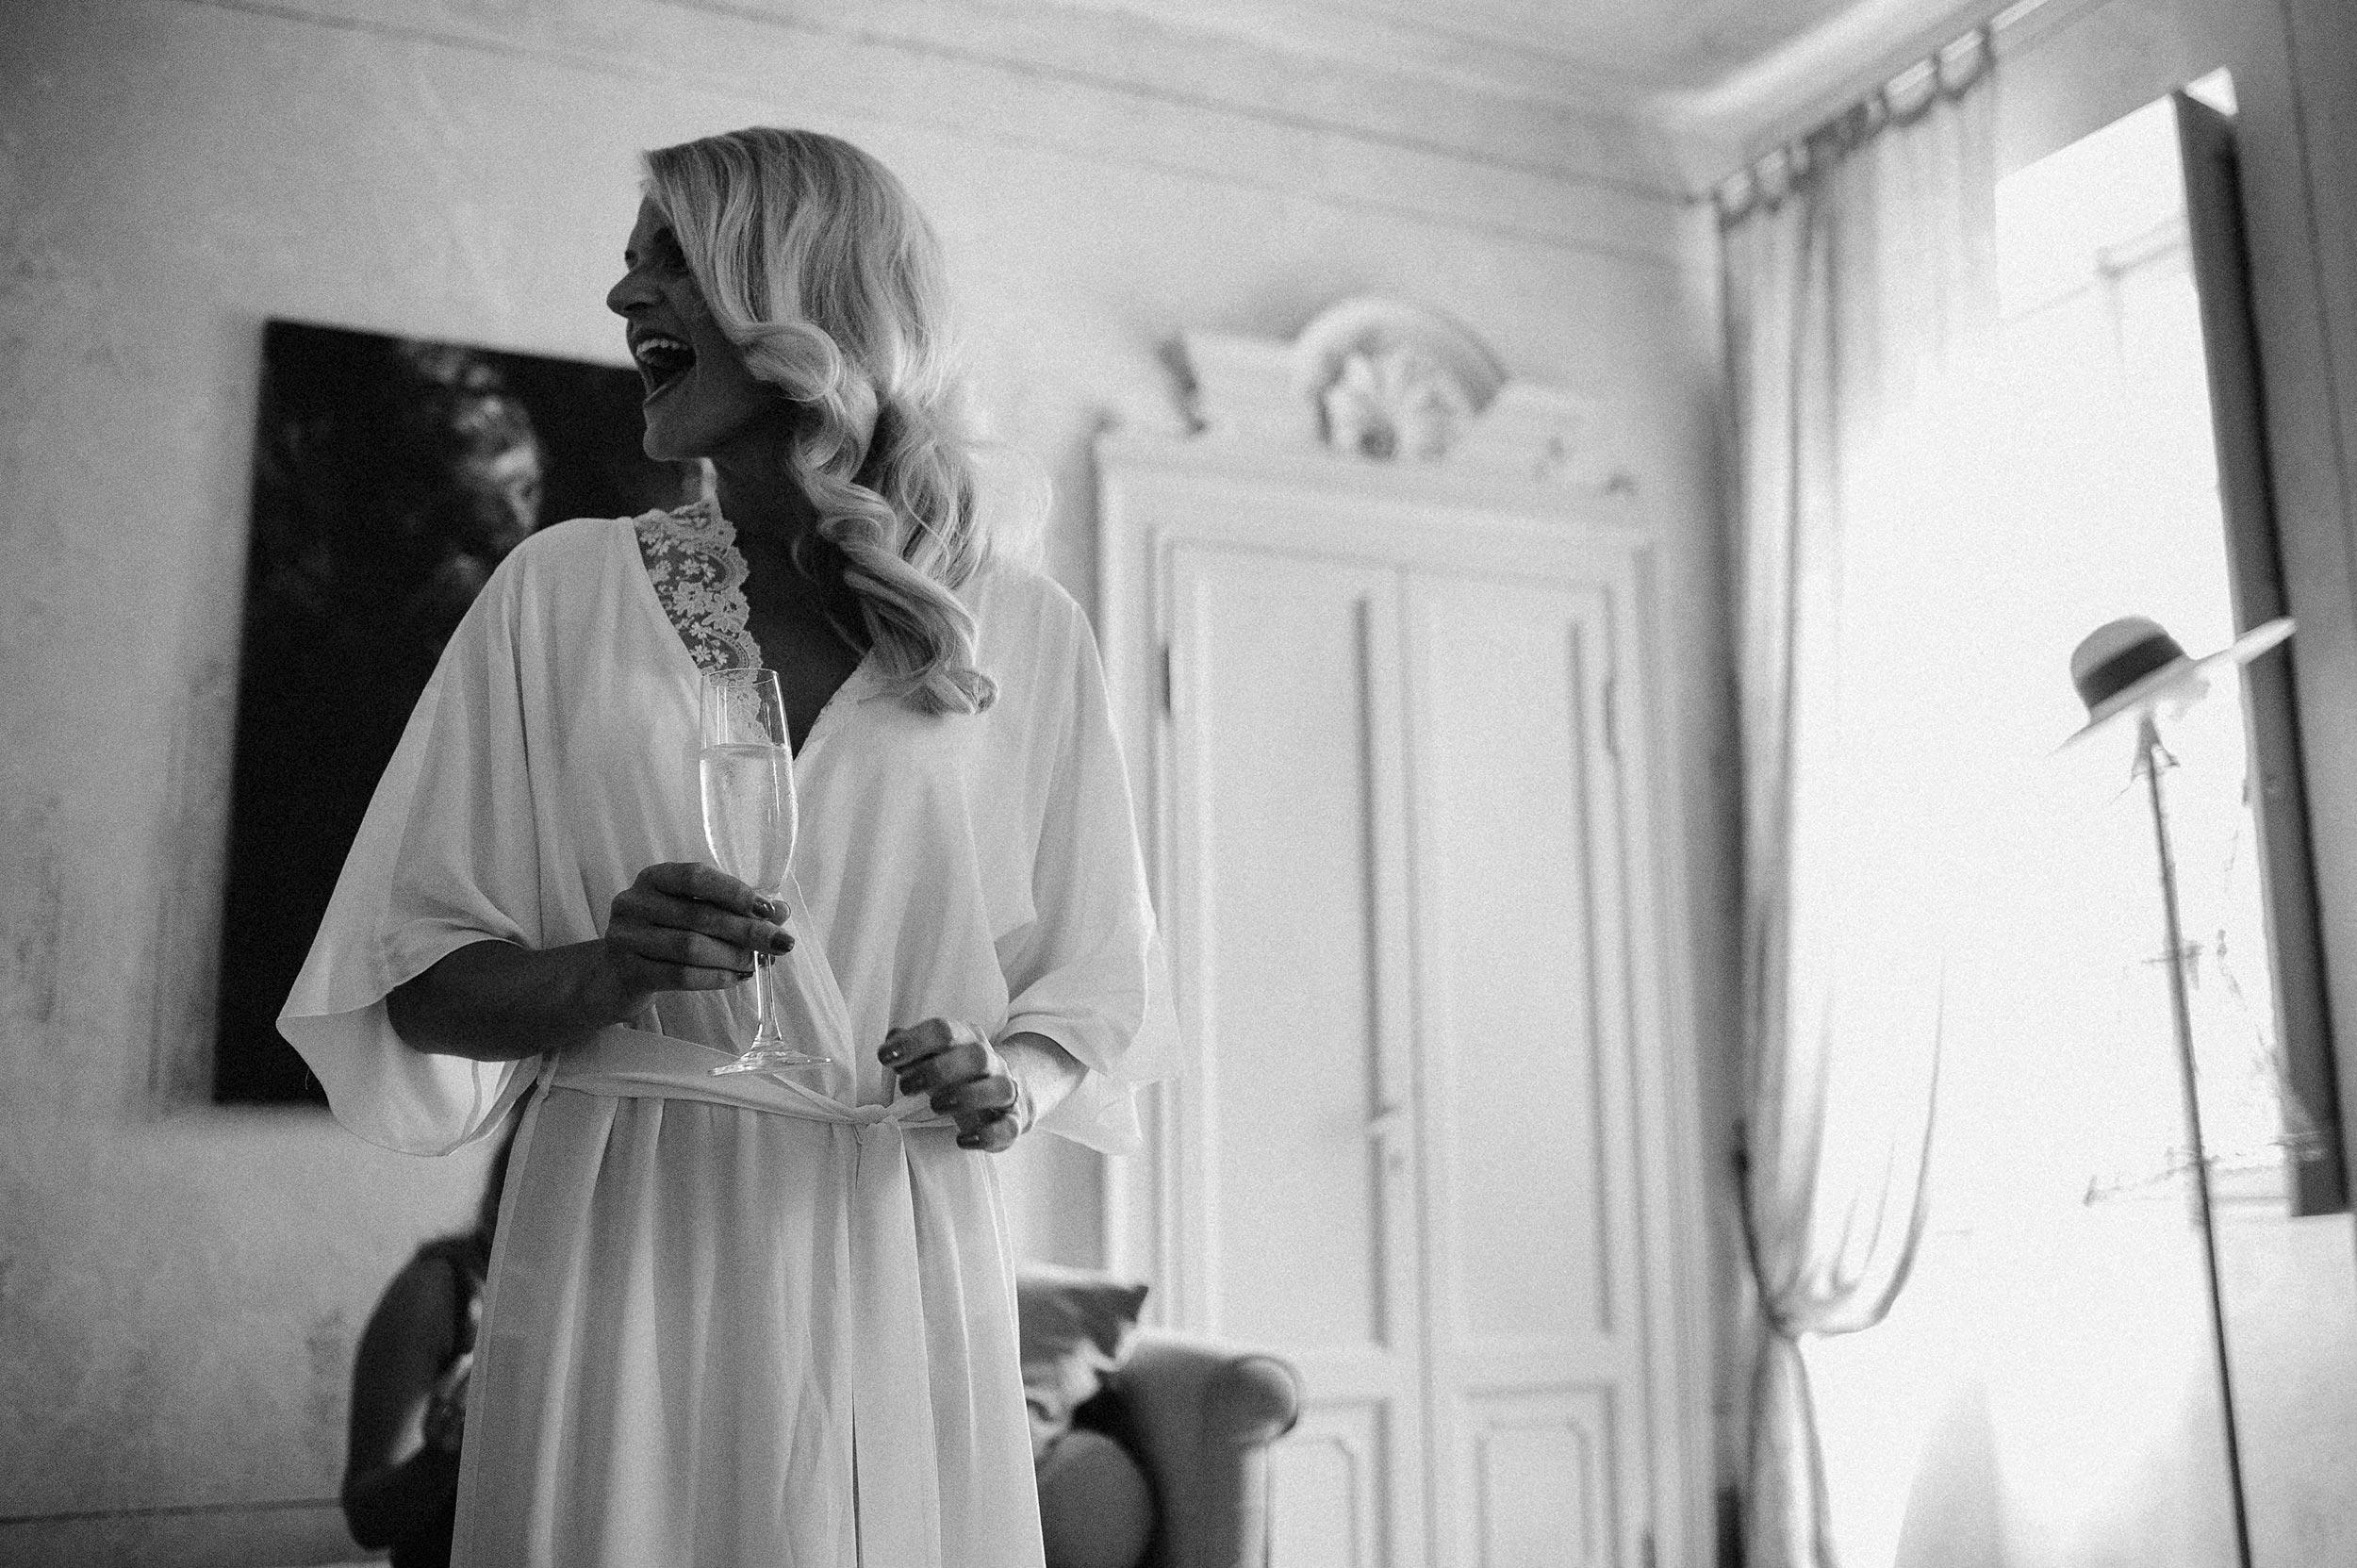 2018-Villa-Regina-Teodolinda-Lake-Como-Wedding-Photographer-Italy-Alessandro-Avenali-54.jpg